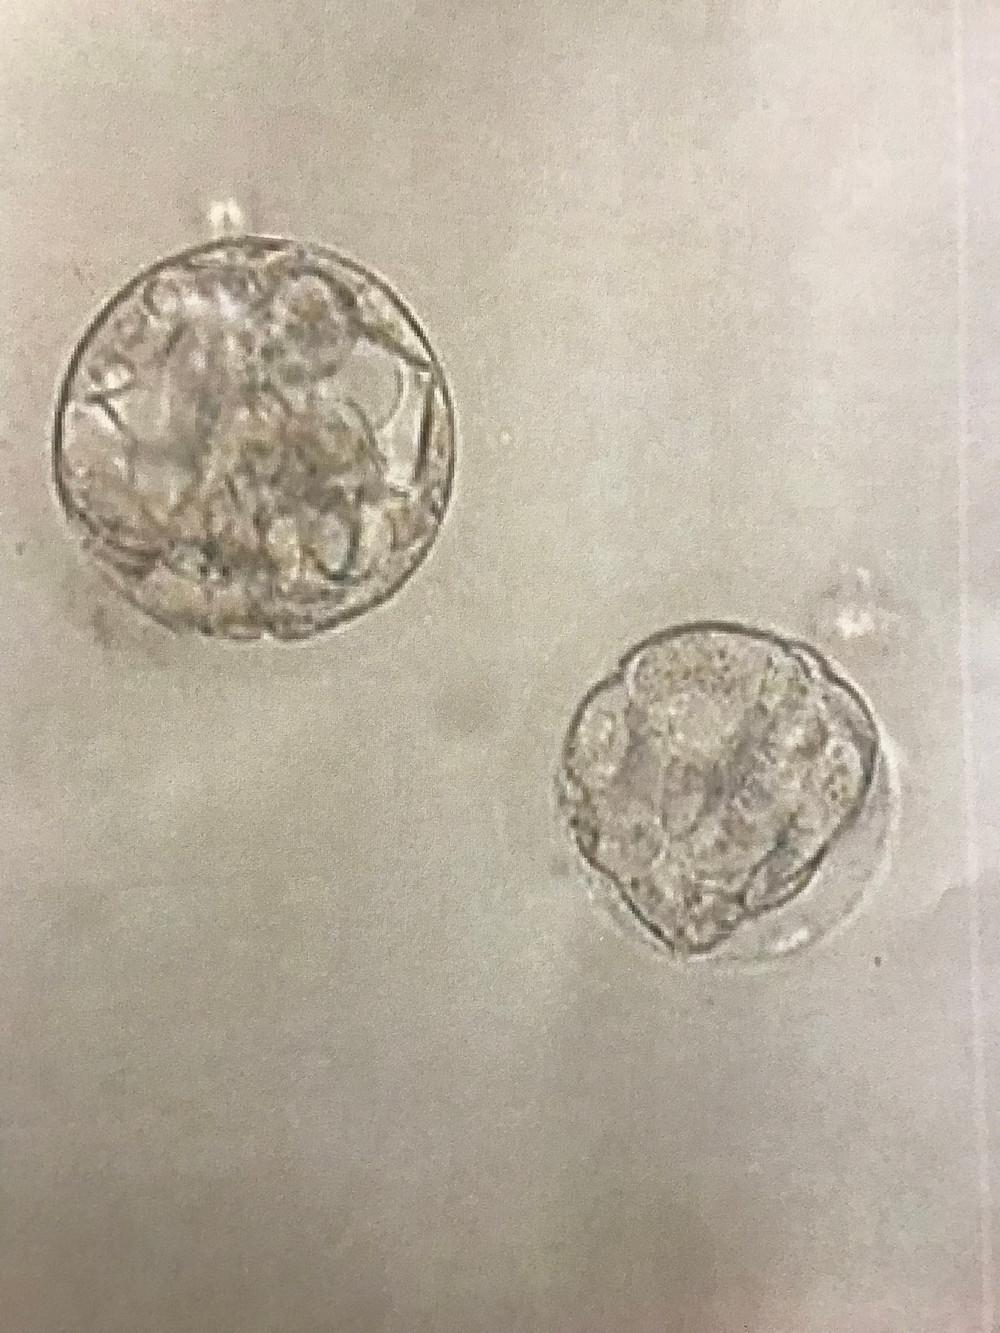 Physician Infertility Embryos